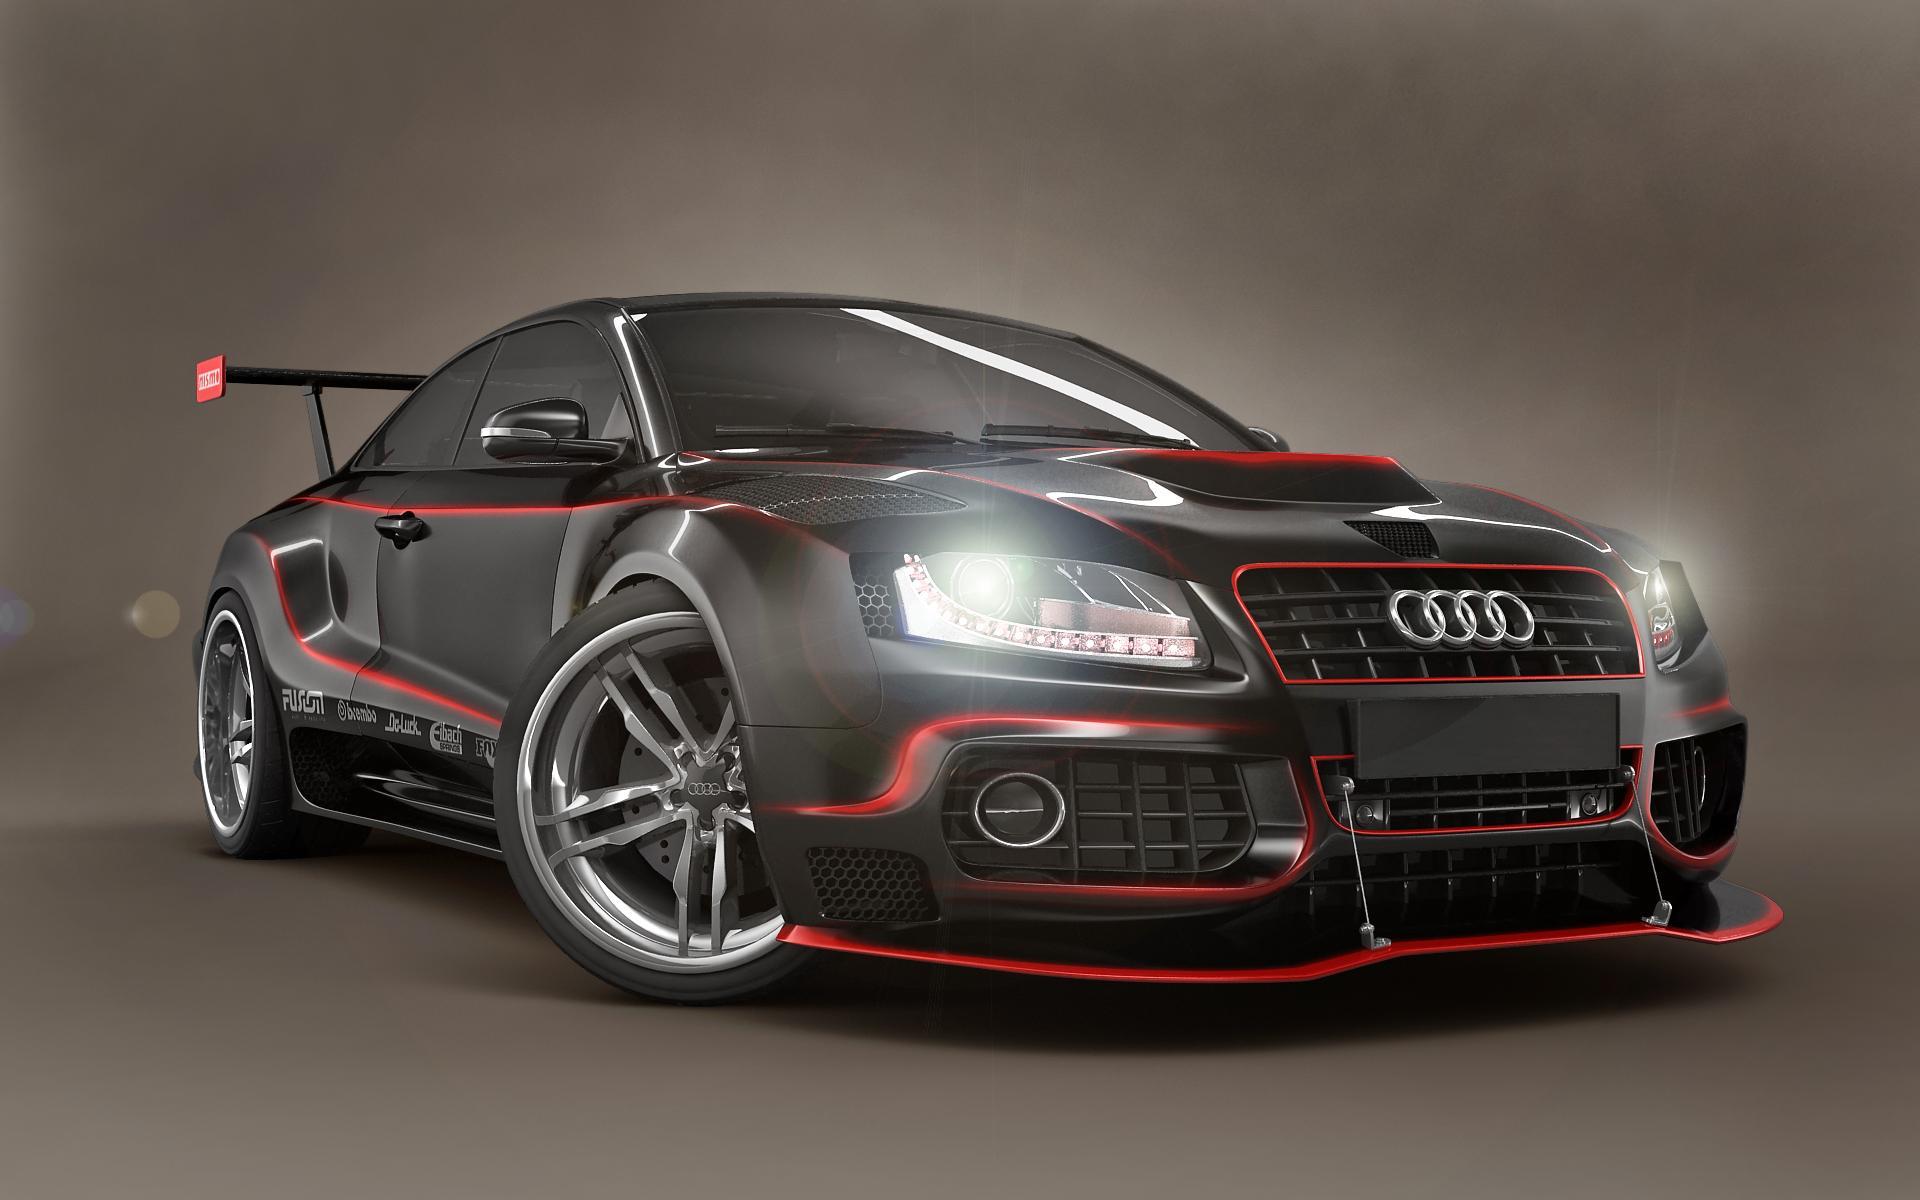 Audi A5 GTR by ~stefanmarius